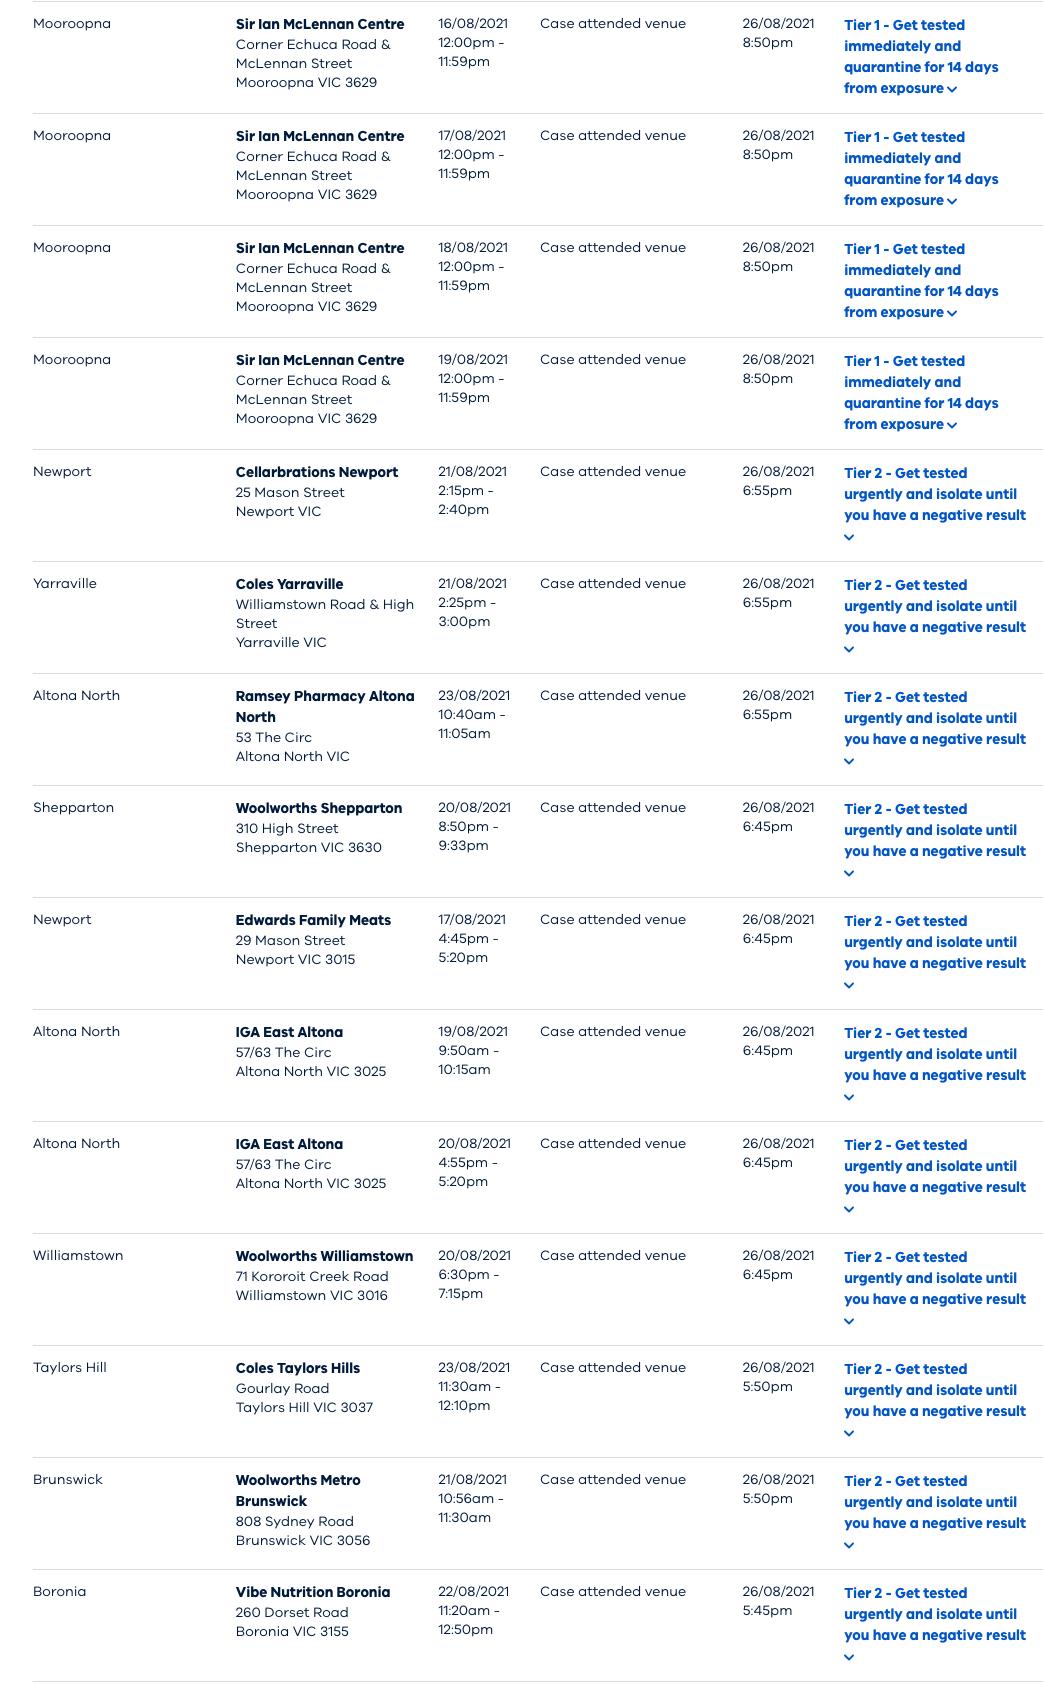 www.coronavirus.vic.gov.au_exposure-sites (13)的副本.png